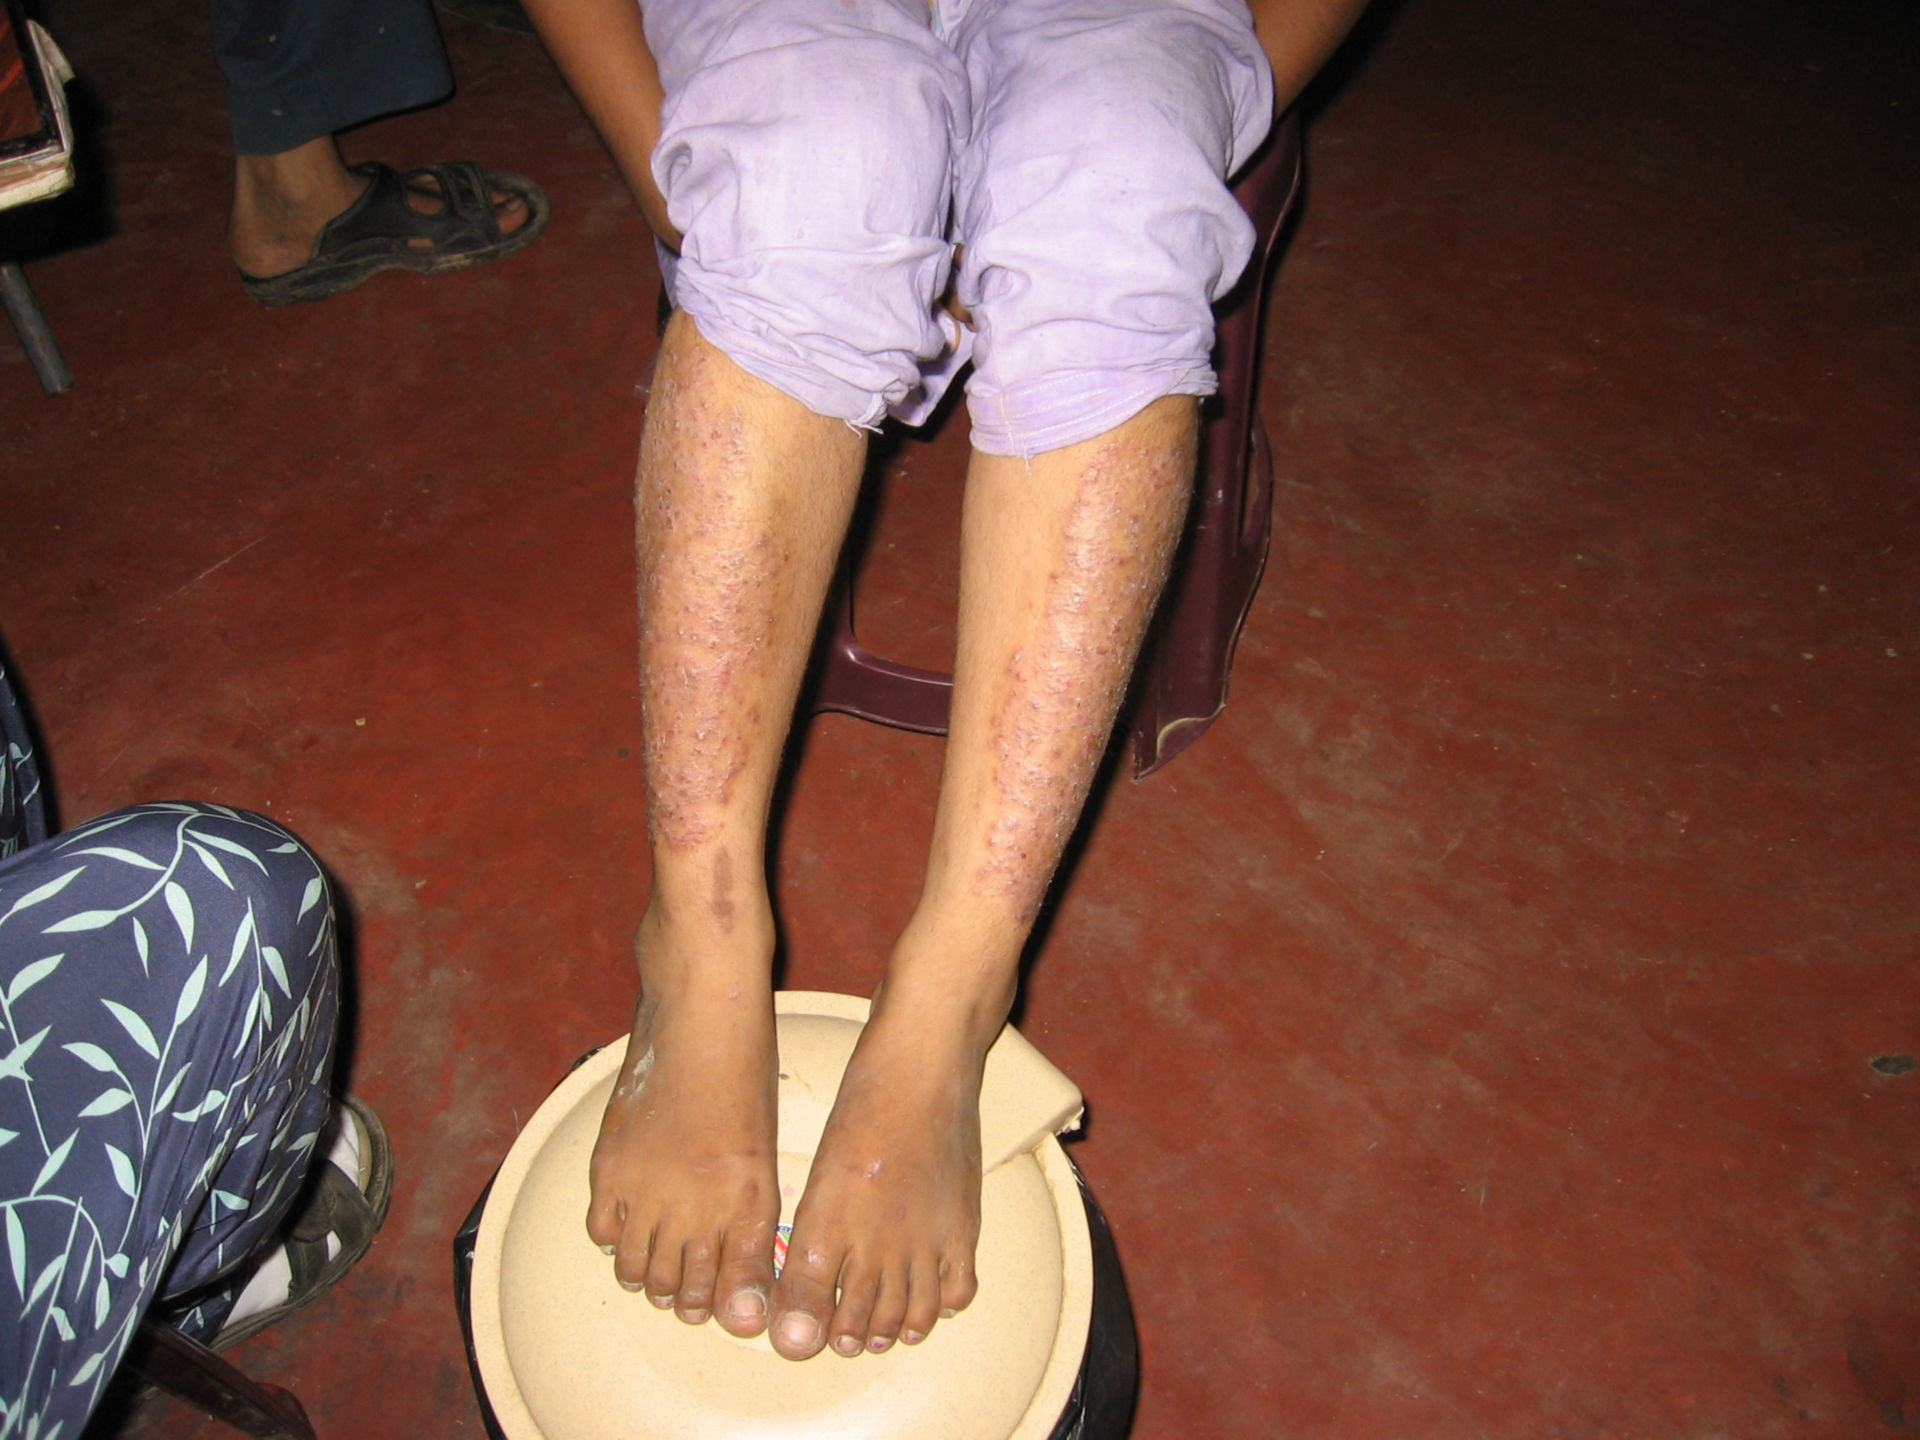 Tuberculous leprosy